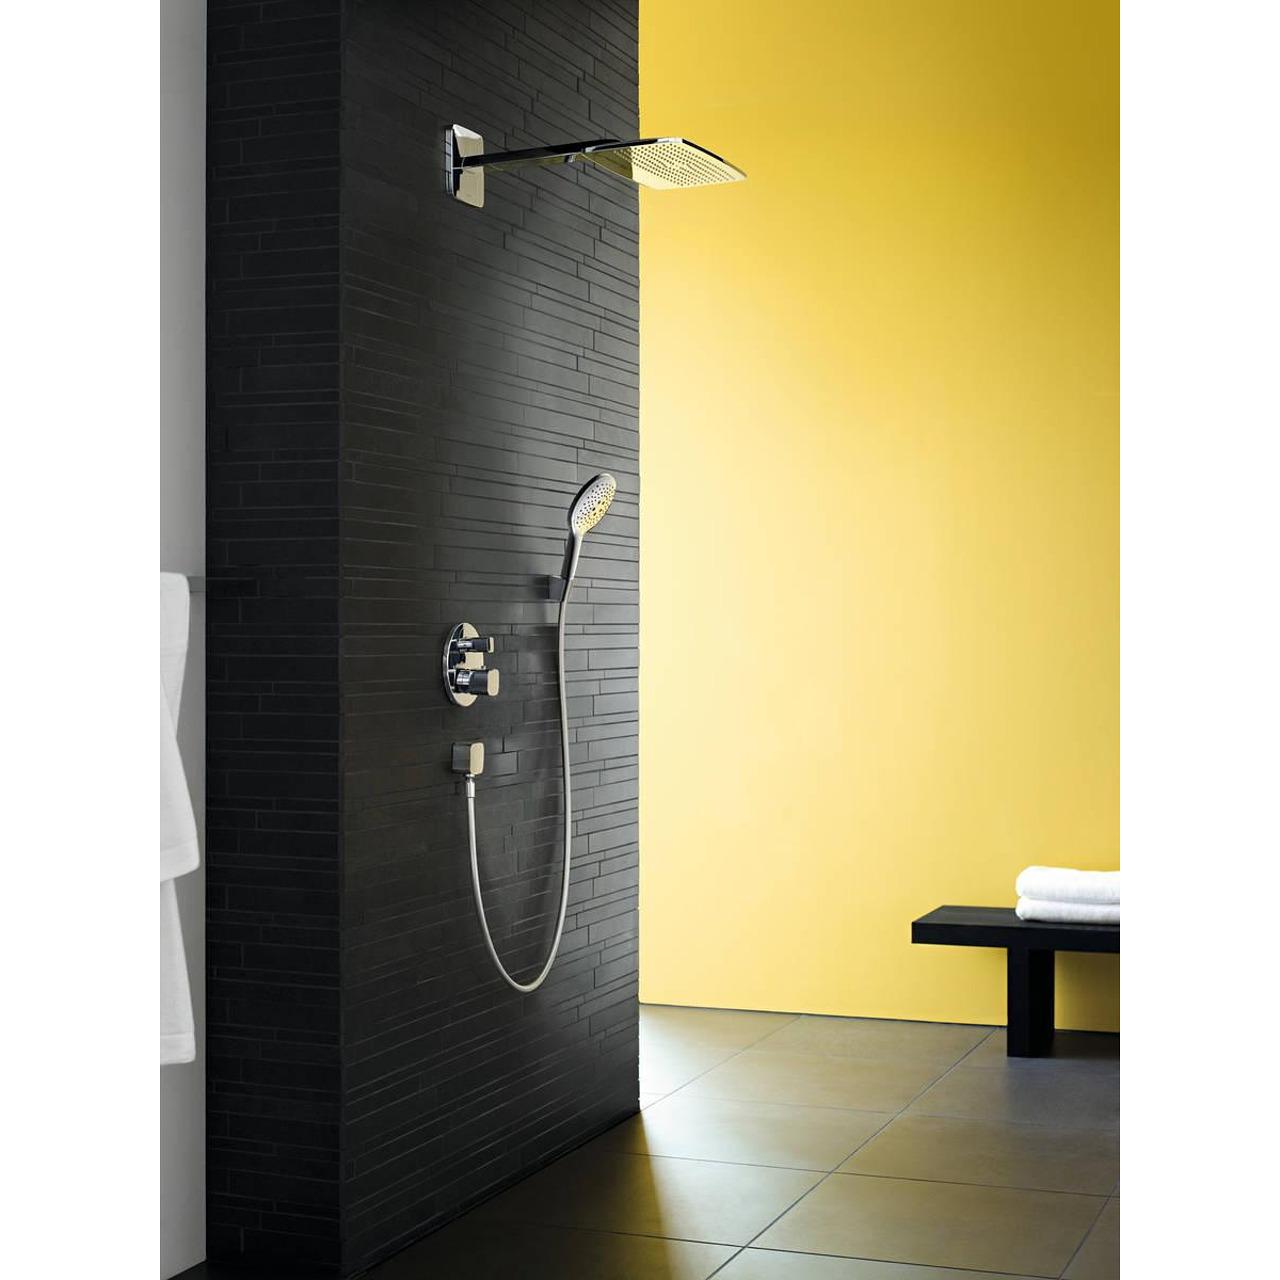 Ръчен душ с 3 типа струи HANSGROHE Raindance Select S 150 28587000